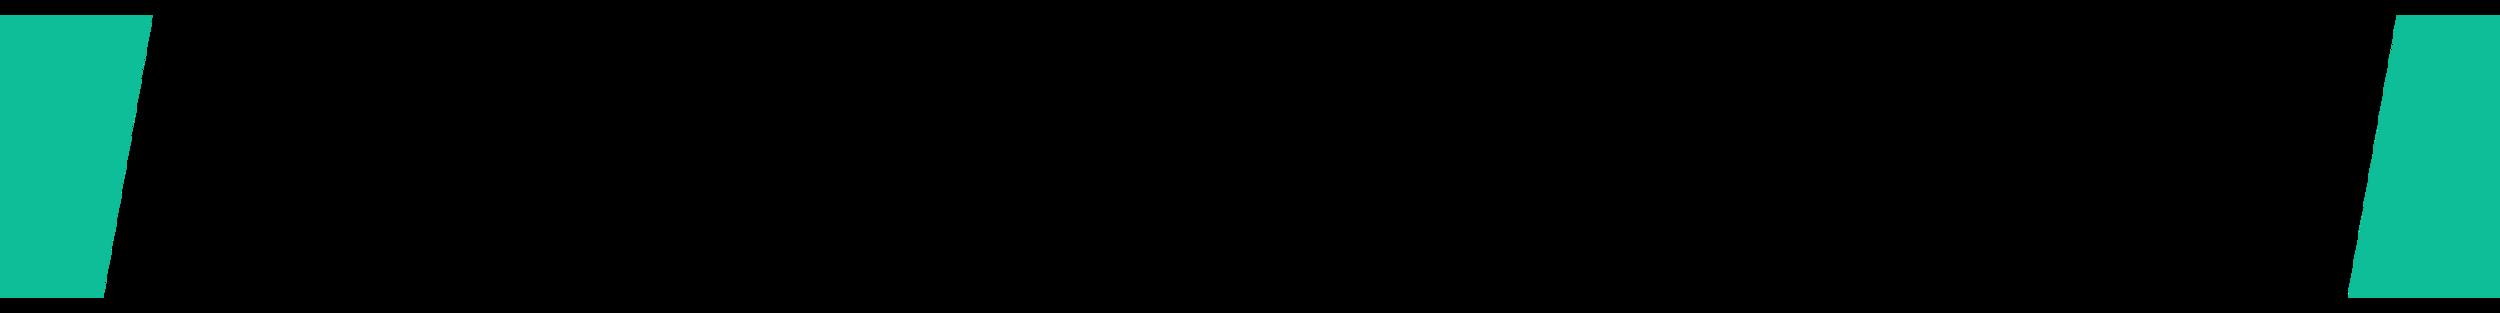 huff-post-logo-black.png